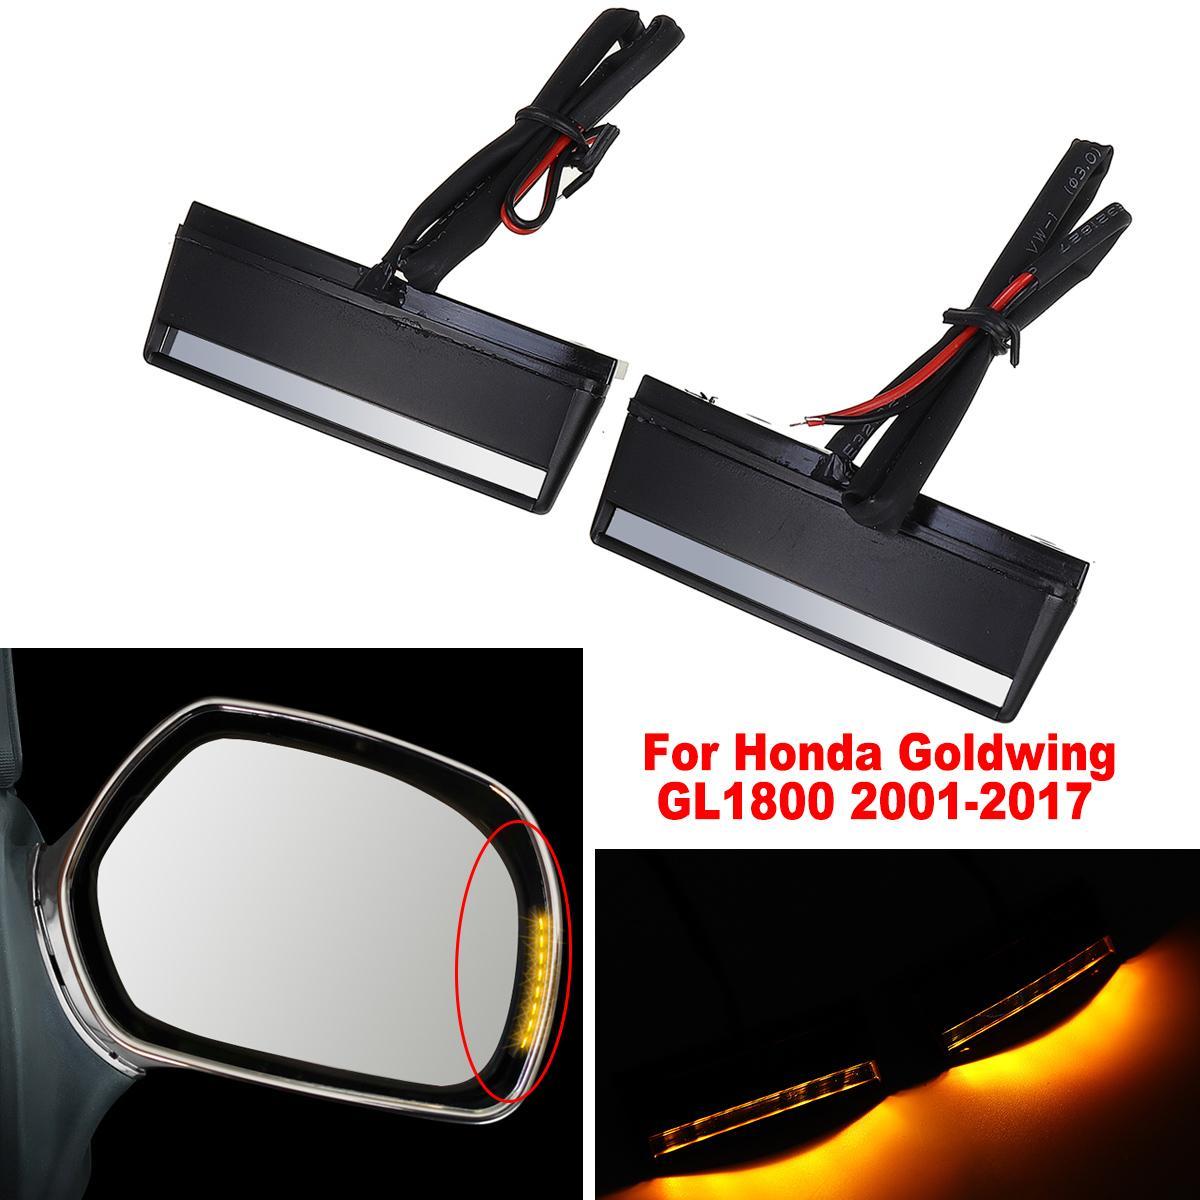 2 uds, luz LED de intermitente ABS ámbar para motocicleta, luz de espejo lateral para Honda Goldwing GL1800 GL 1800 2001-2017 (#7513)